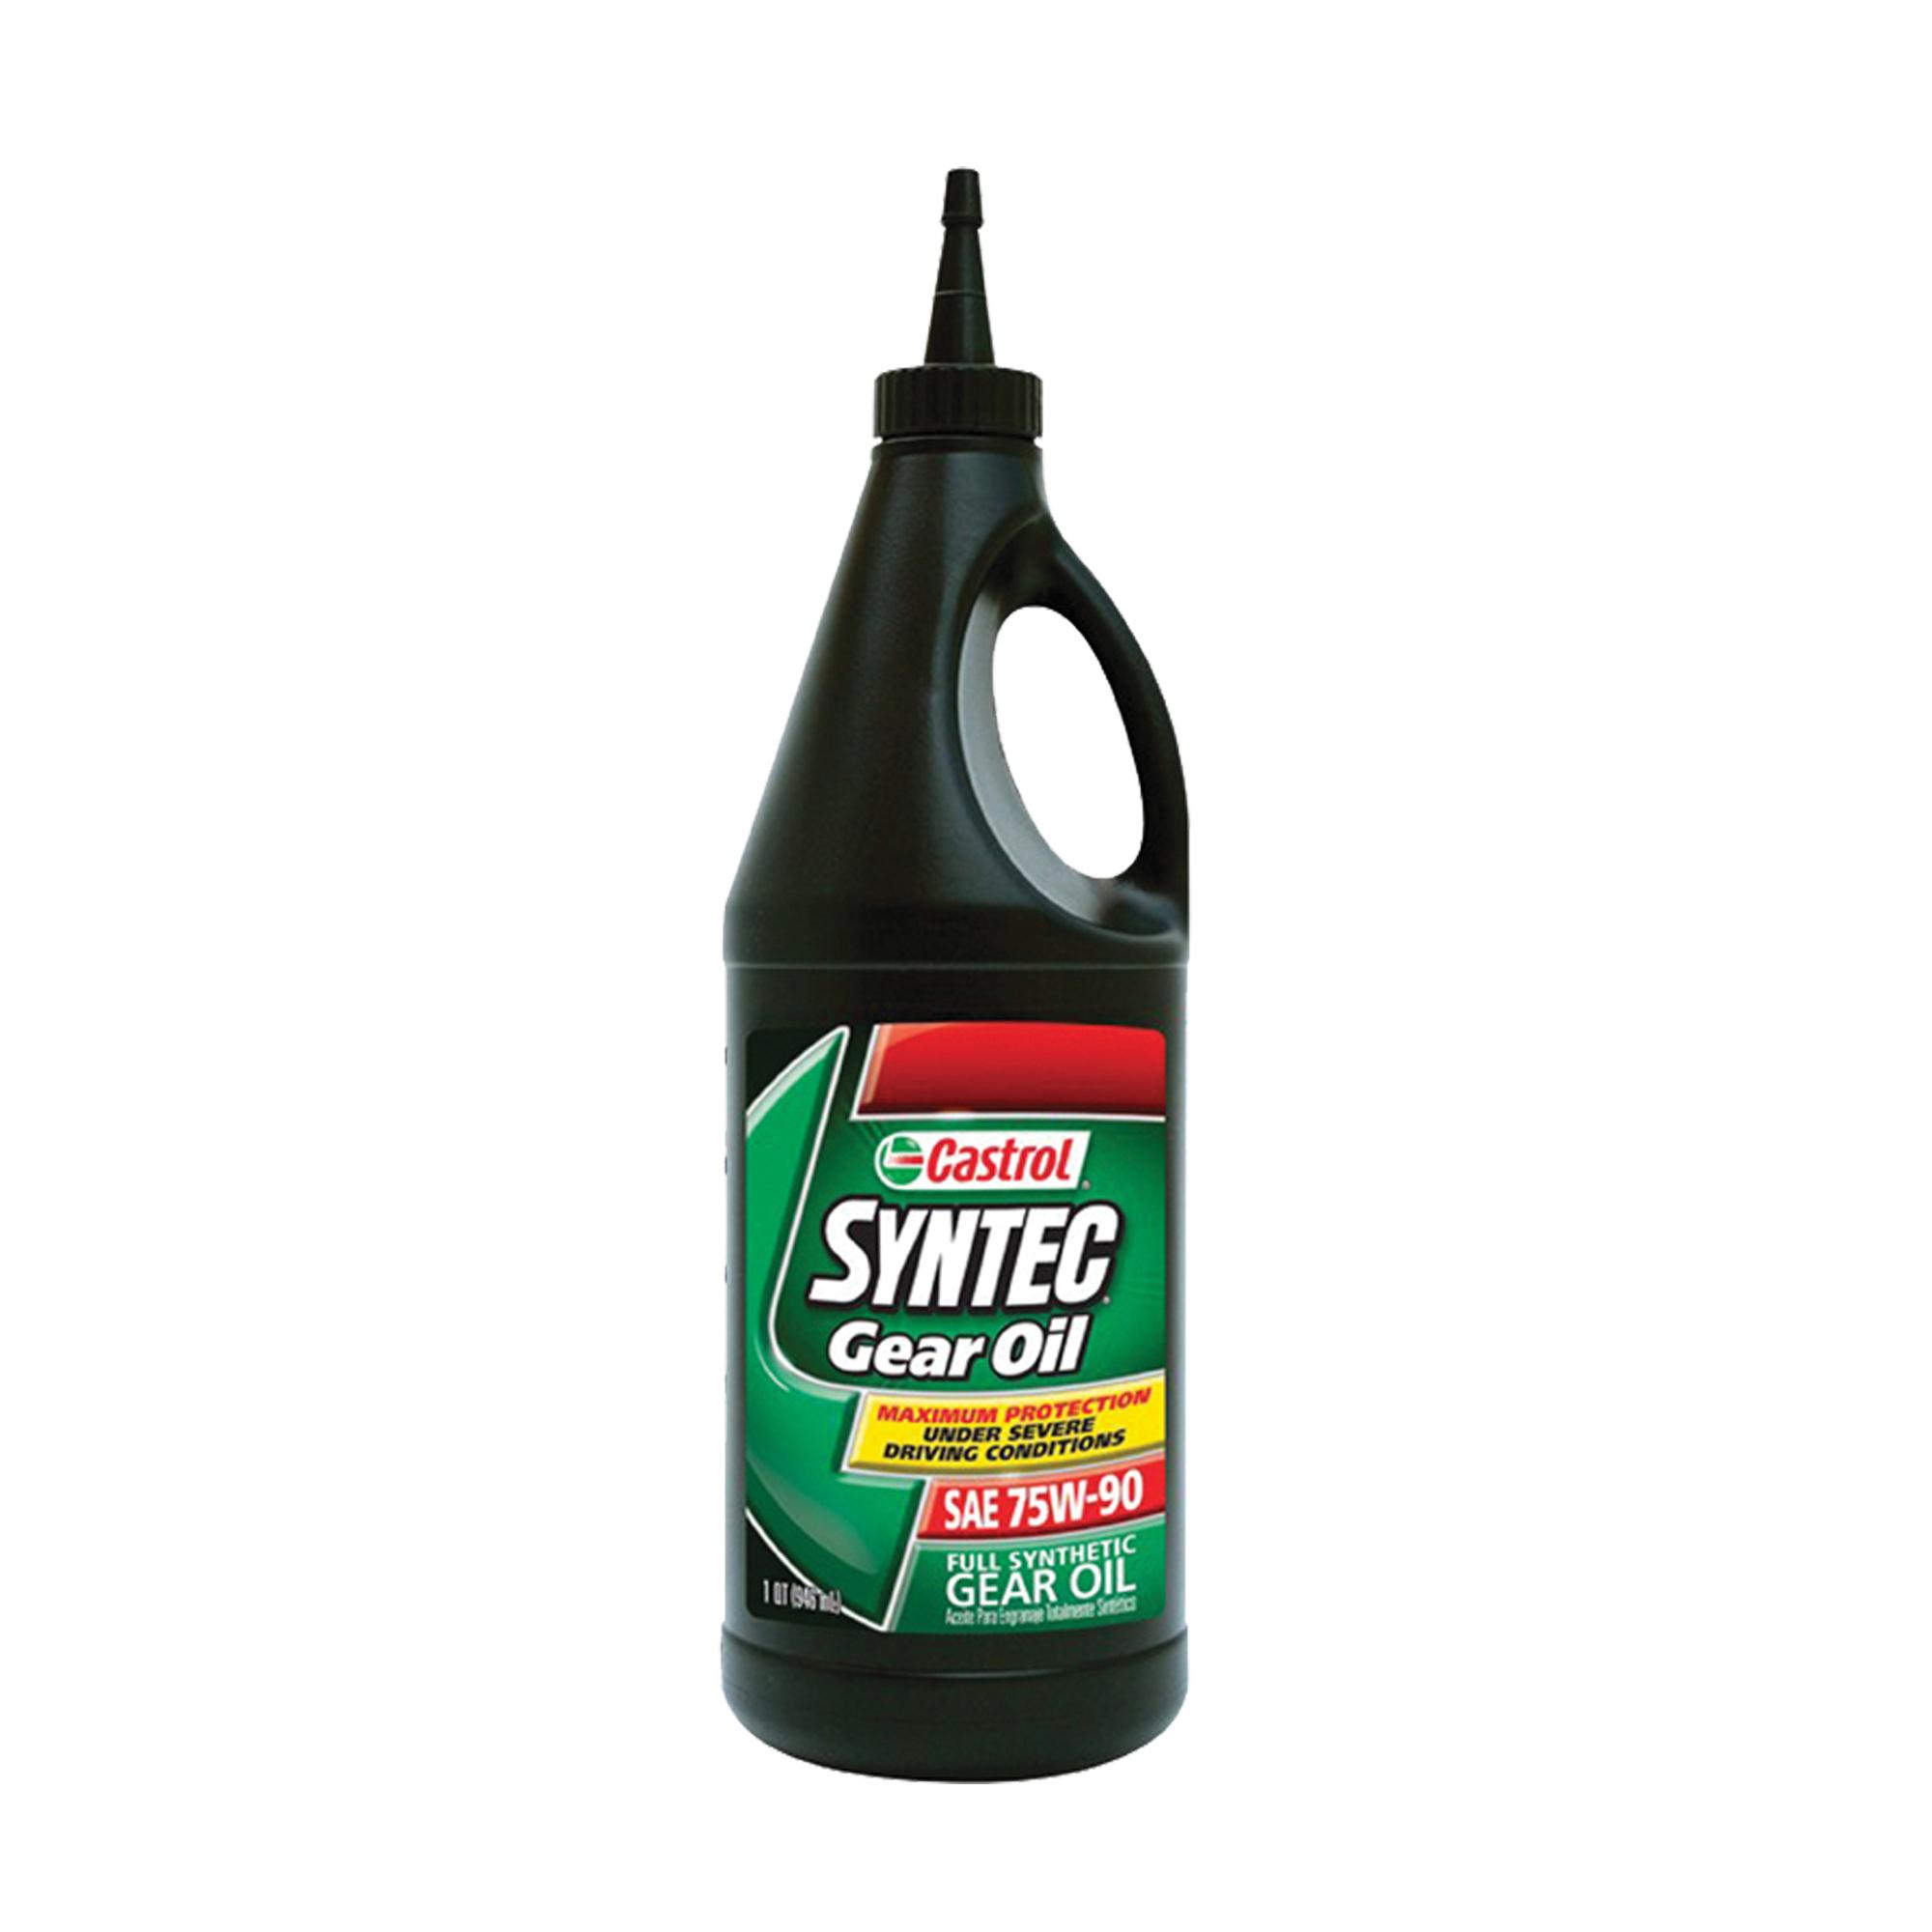 Syntec 75W90 Full Synthetic Gear Oil